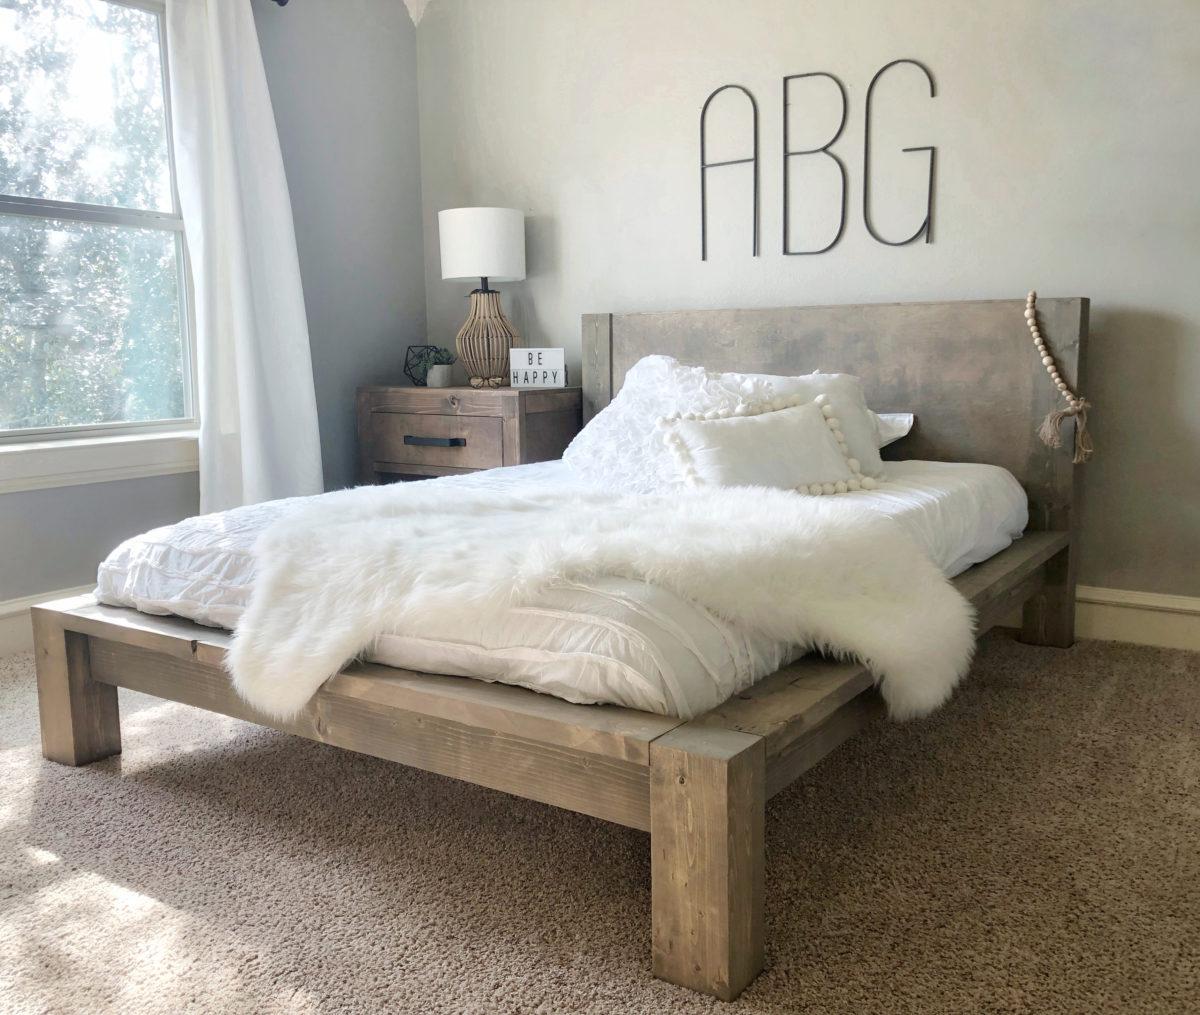 fec1b42912 DIY Rustic Modern Queen Bed - Shanty 2 Chic